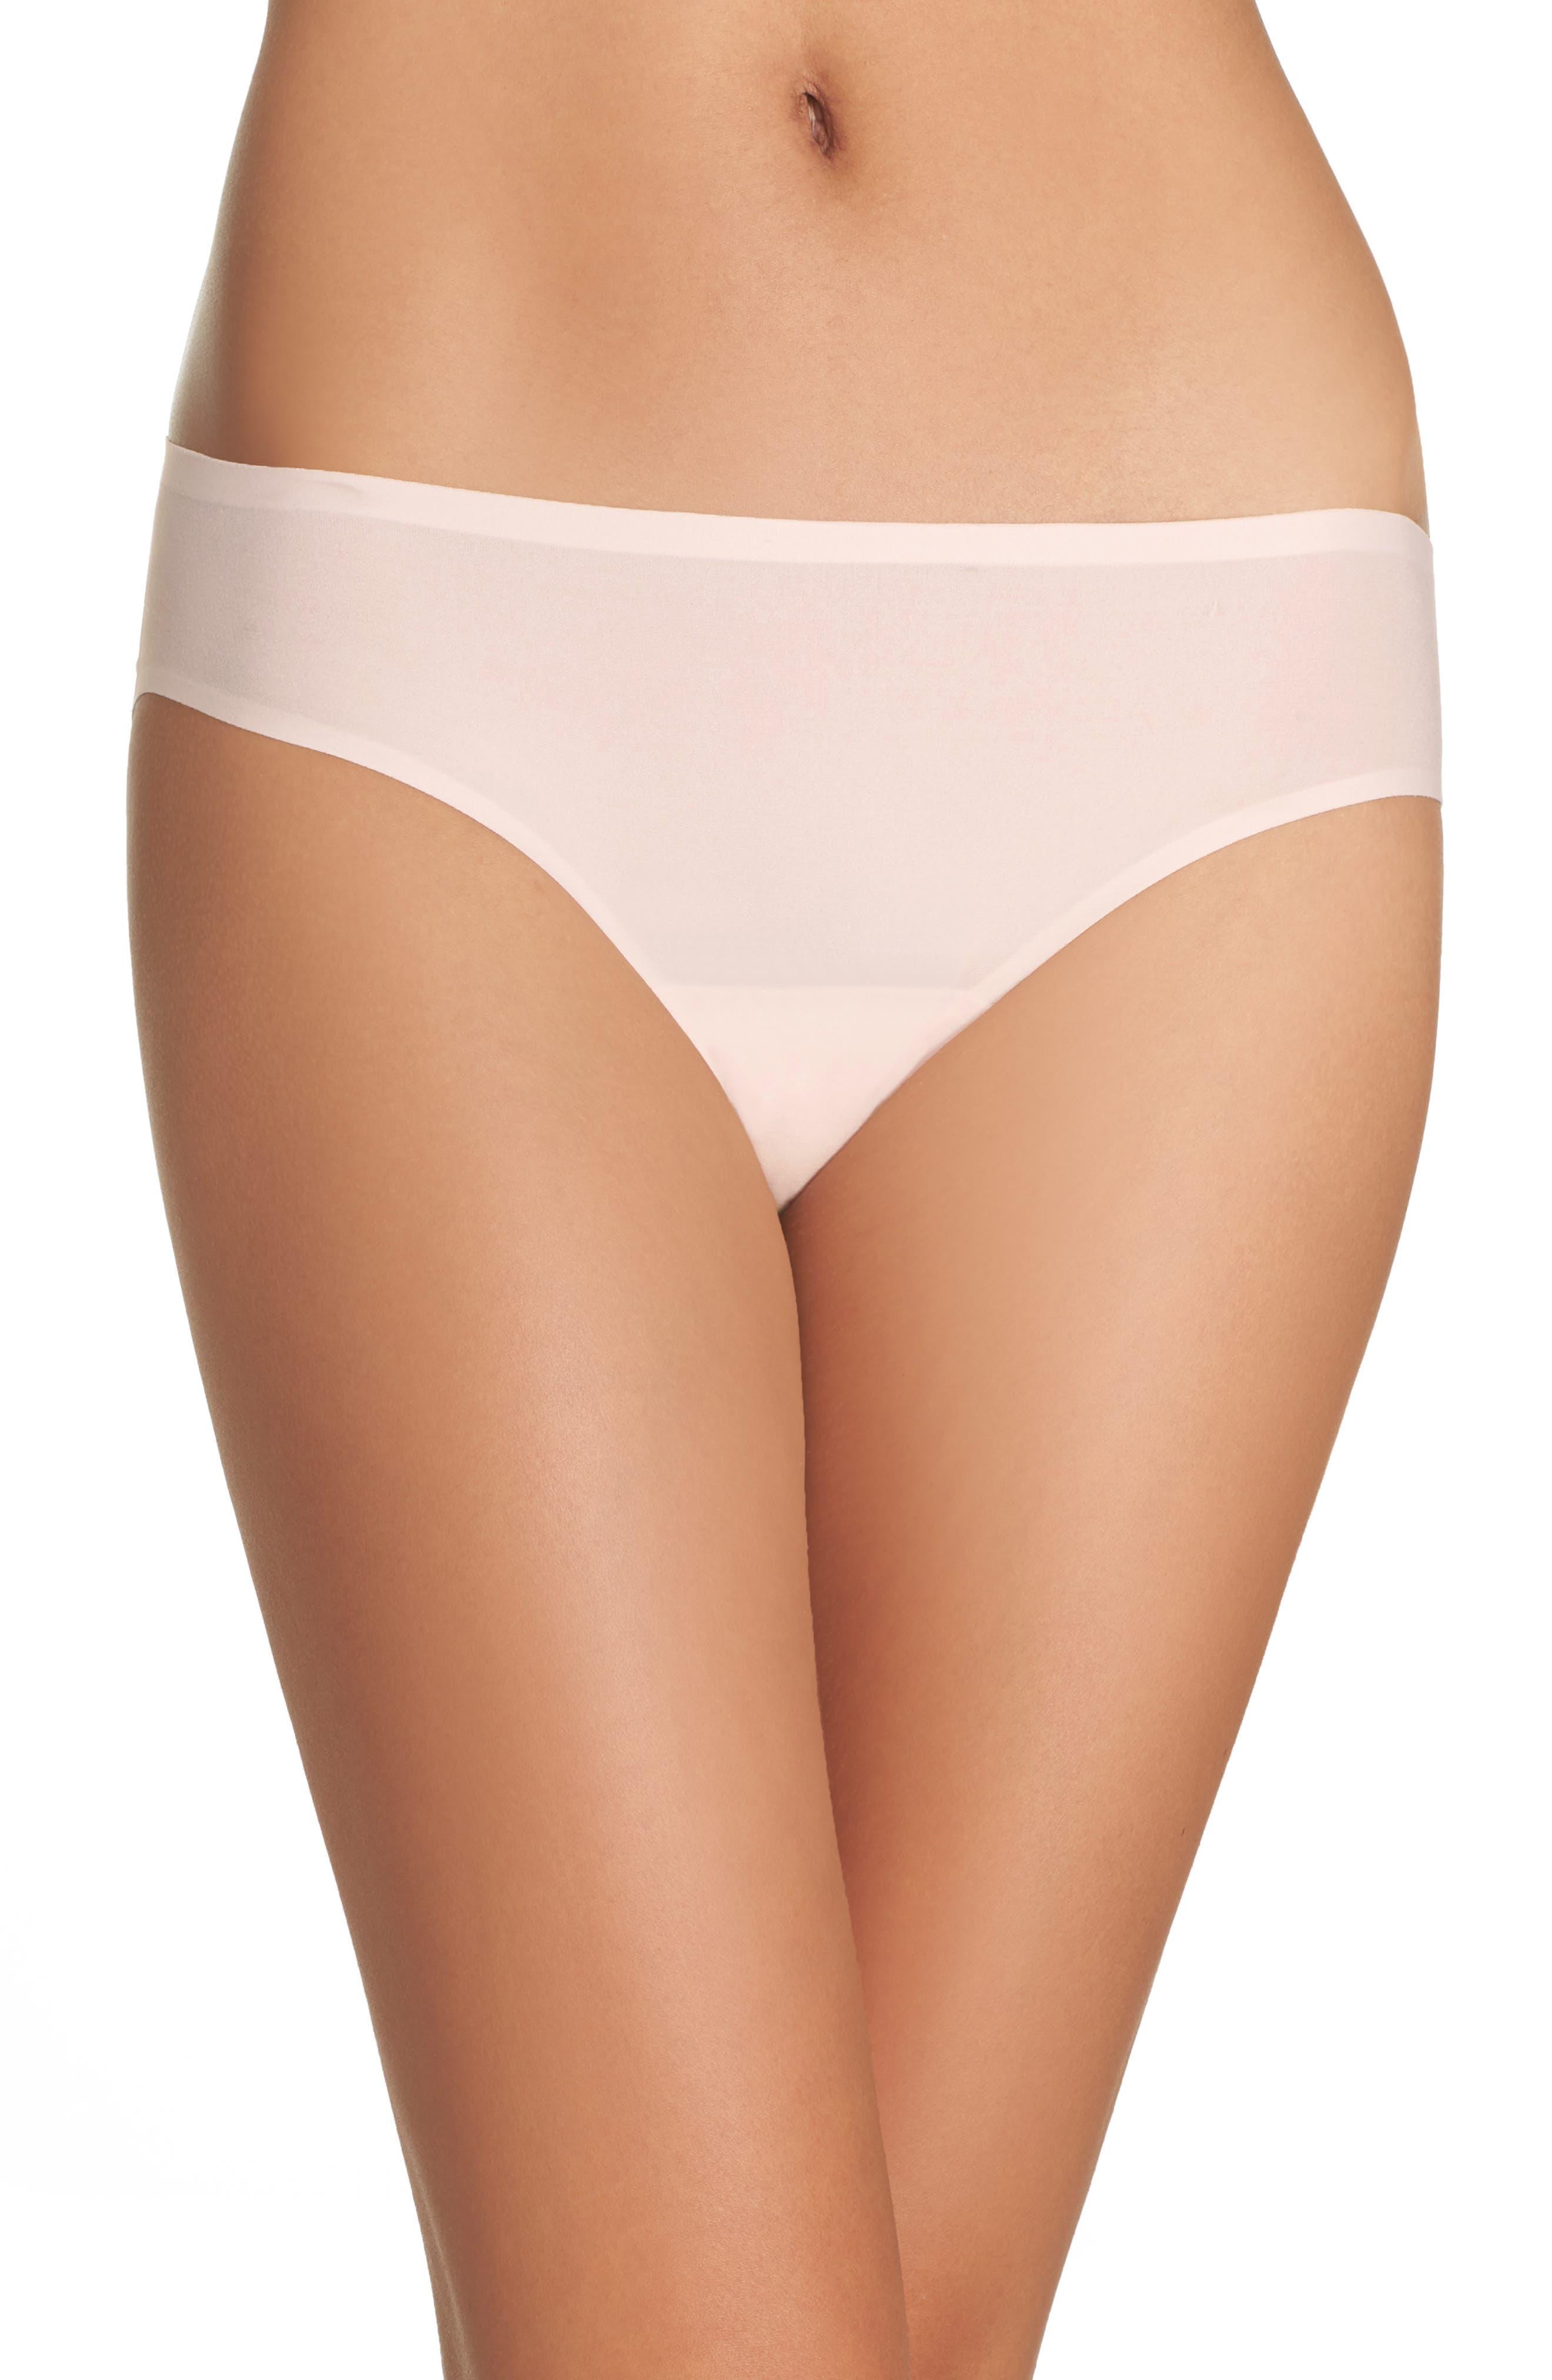 Alternate Image 1 Selected - Chantelle Intimates Soft Stretch Seamless Bikini (3 for $45)